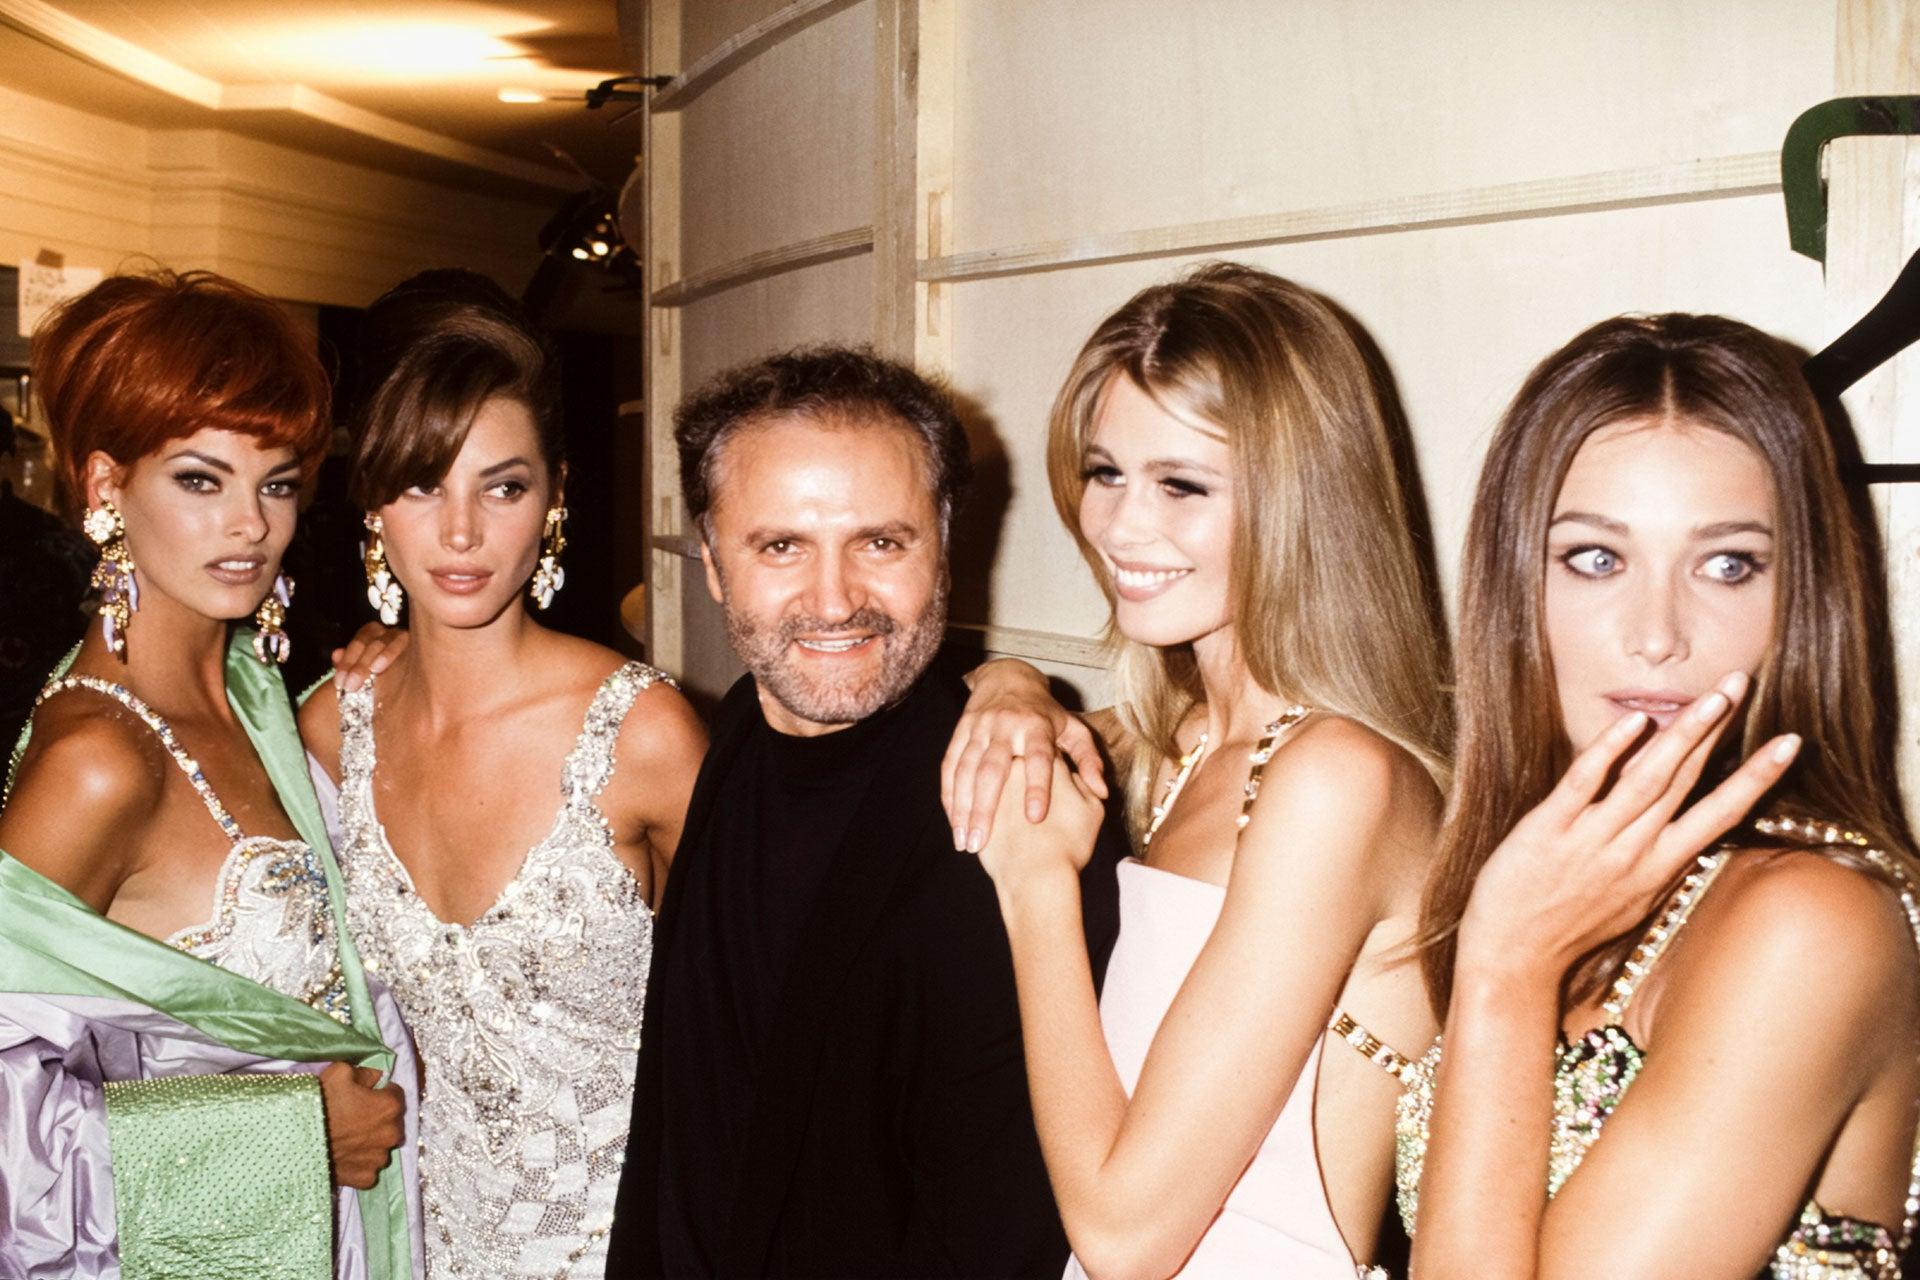 Gianni Versace a Linda Evangelista, Christy Turlington, Claudia Schiffer a Carla Bruni v Paříži, haute couture kolekce Versace AW 91/92 Autor: PAT/ARNAL/Gamma-Rapho via Getty Images